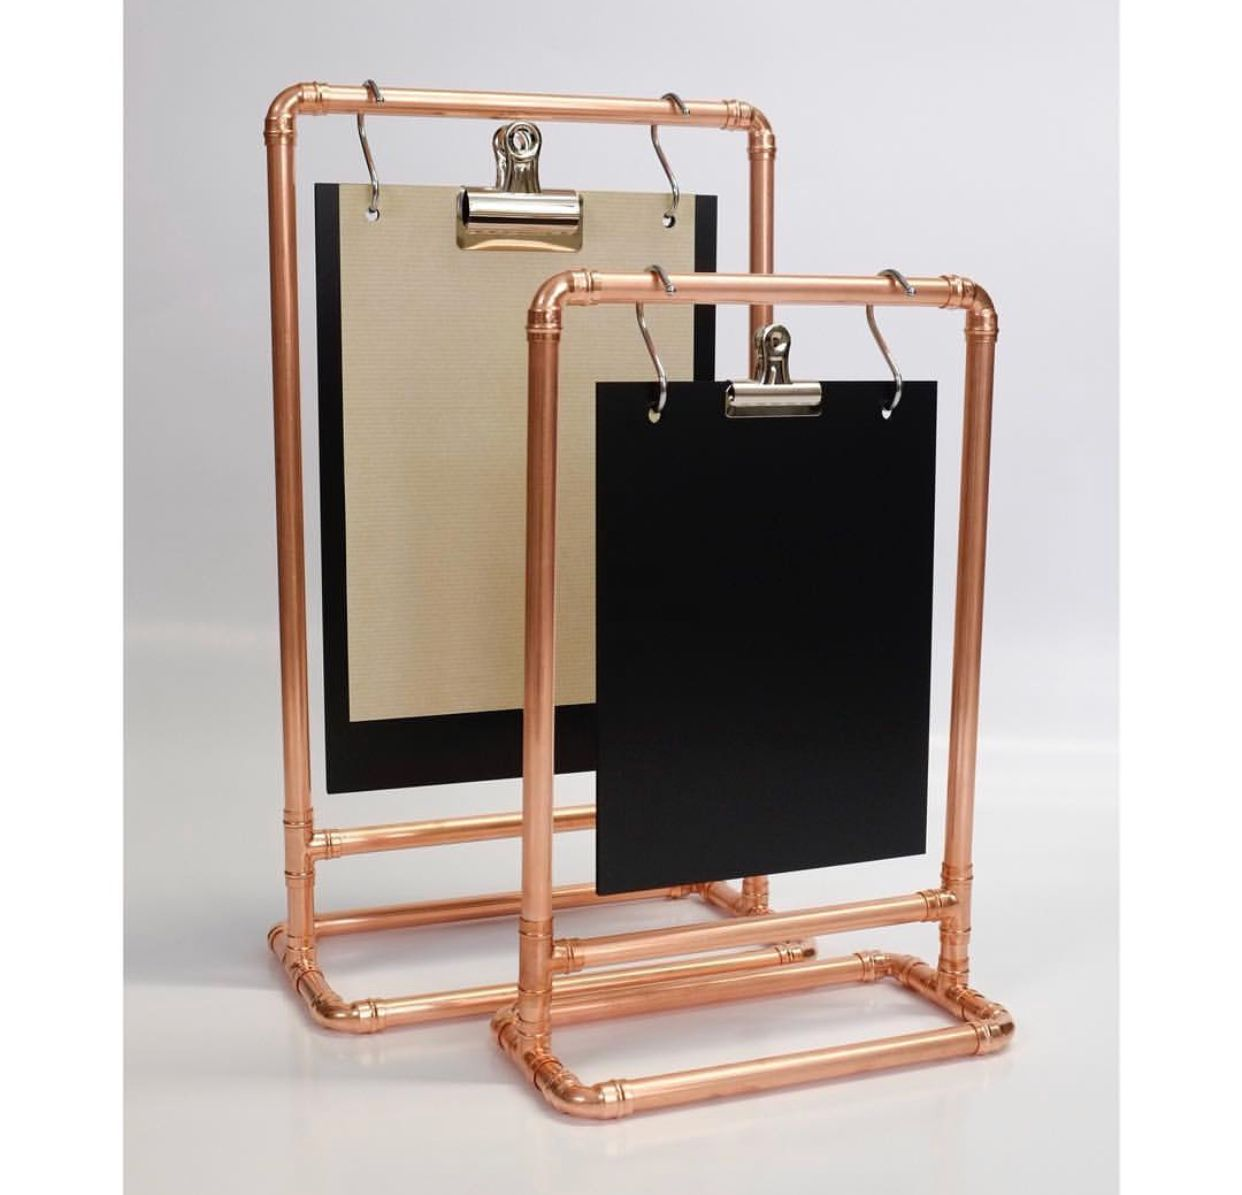 picture freeuse library Mini hanging counter top. Board clip copper